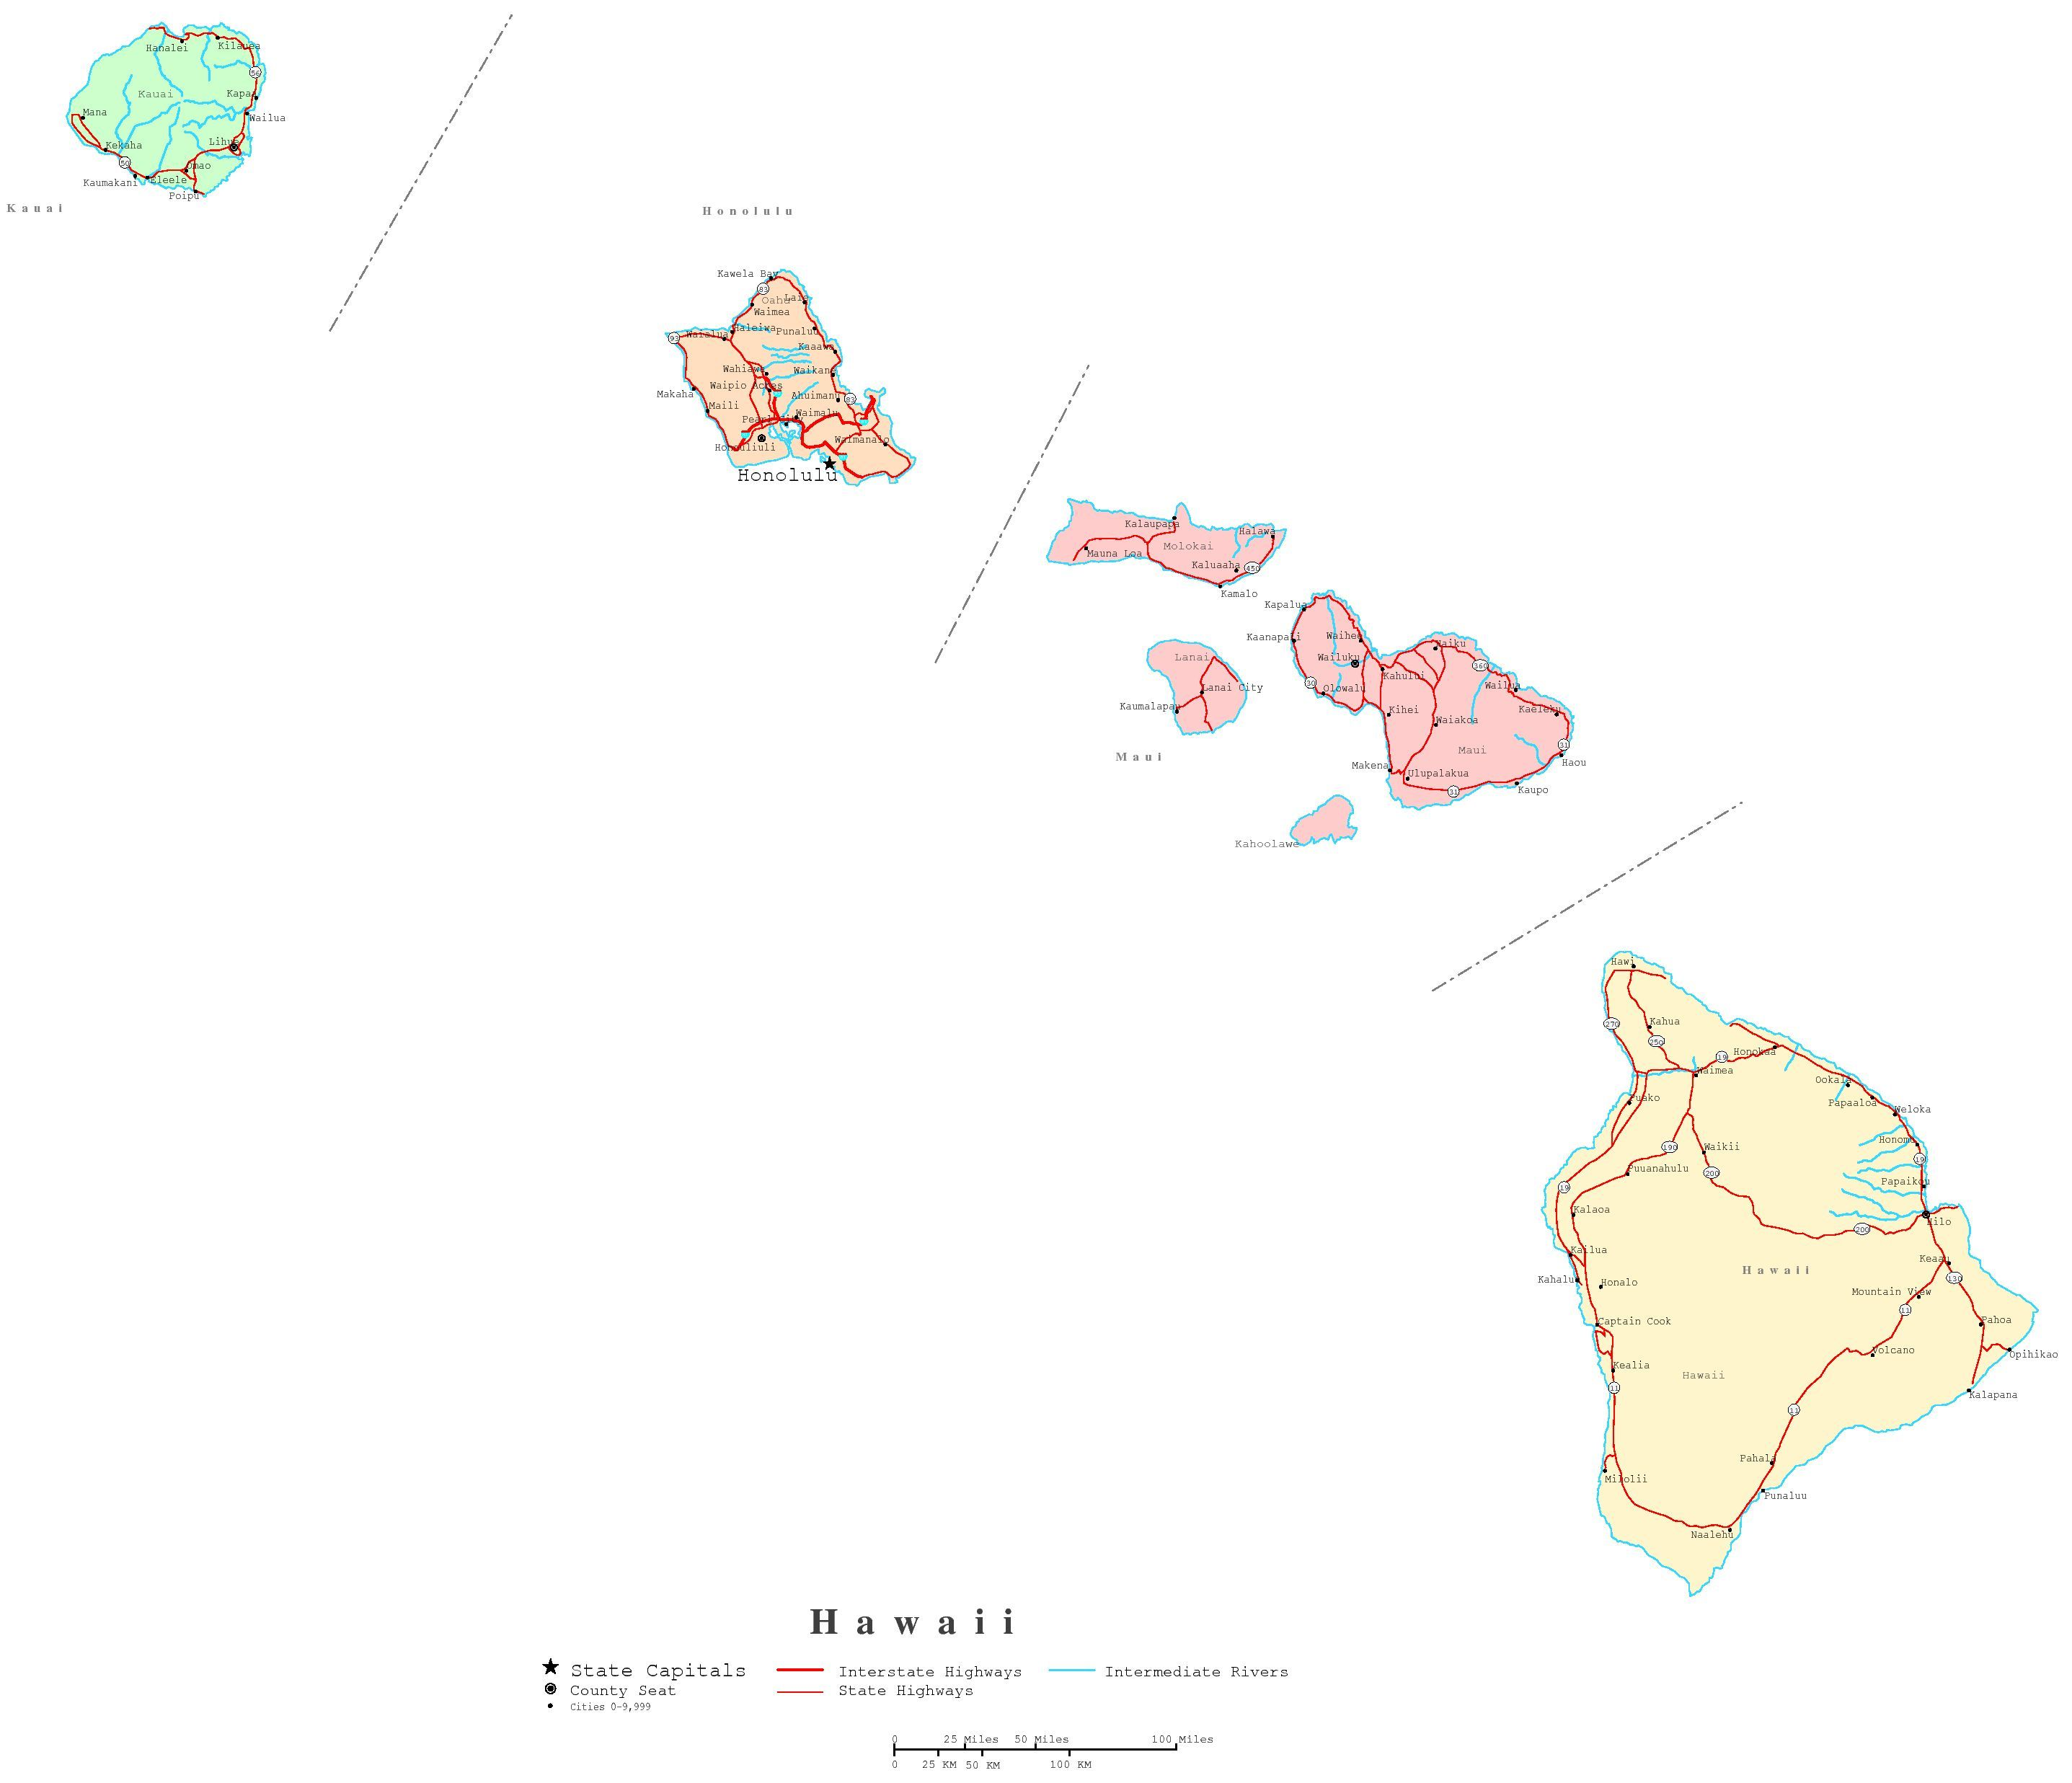 Free Printable Hawaii State Maps